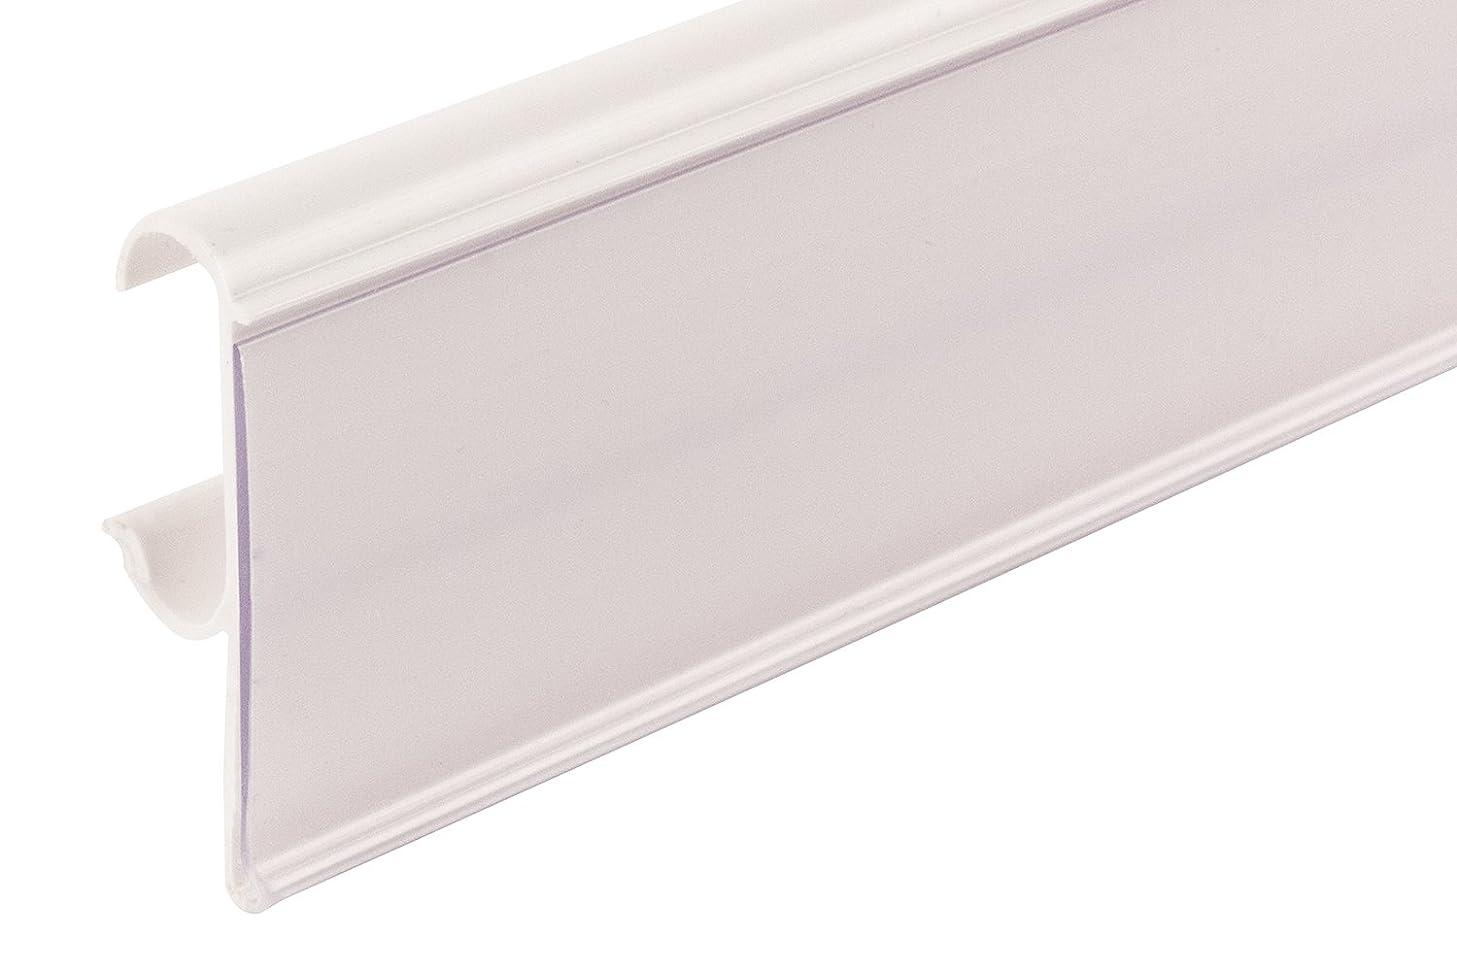 FFR Merchandising 4405757101 Data Strip Label Holder for Double Wire Shelf, White (Pack of 65)